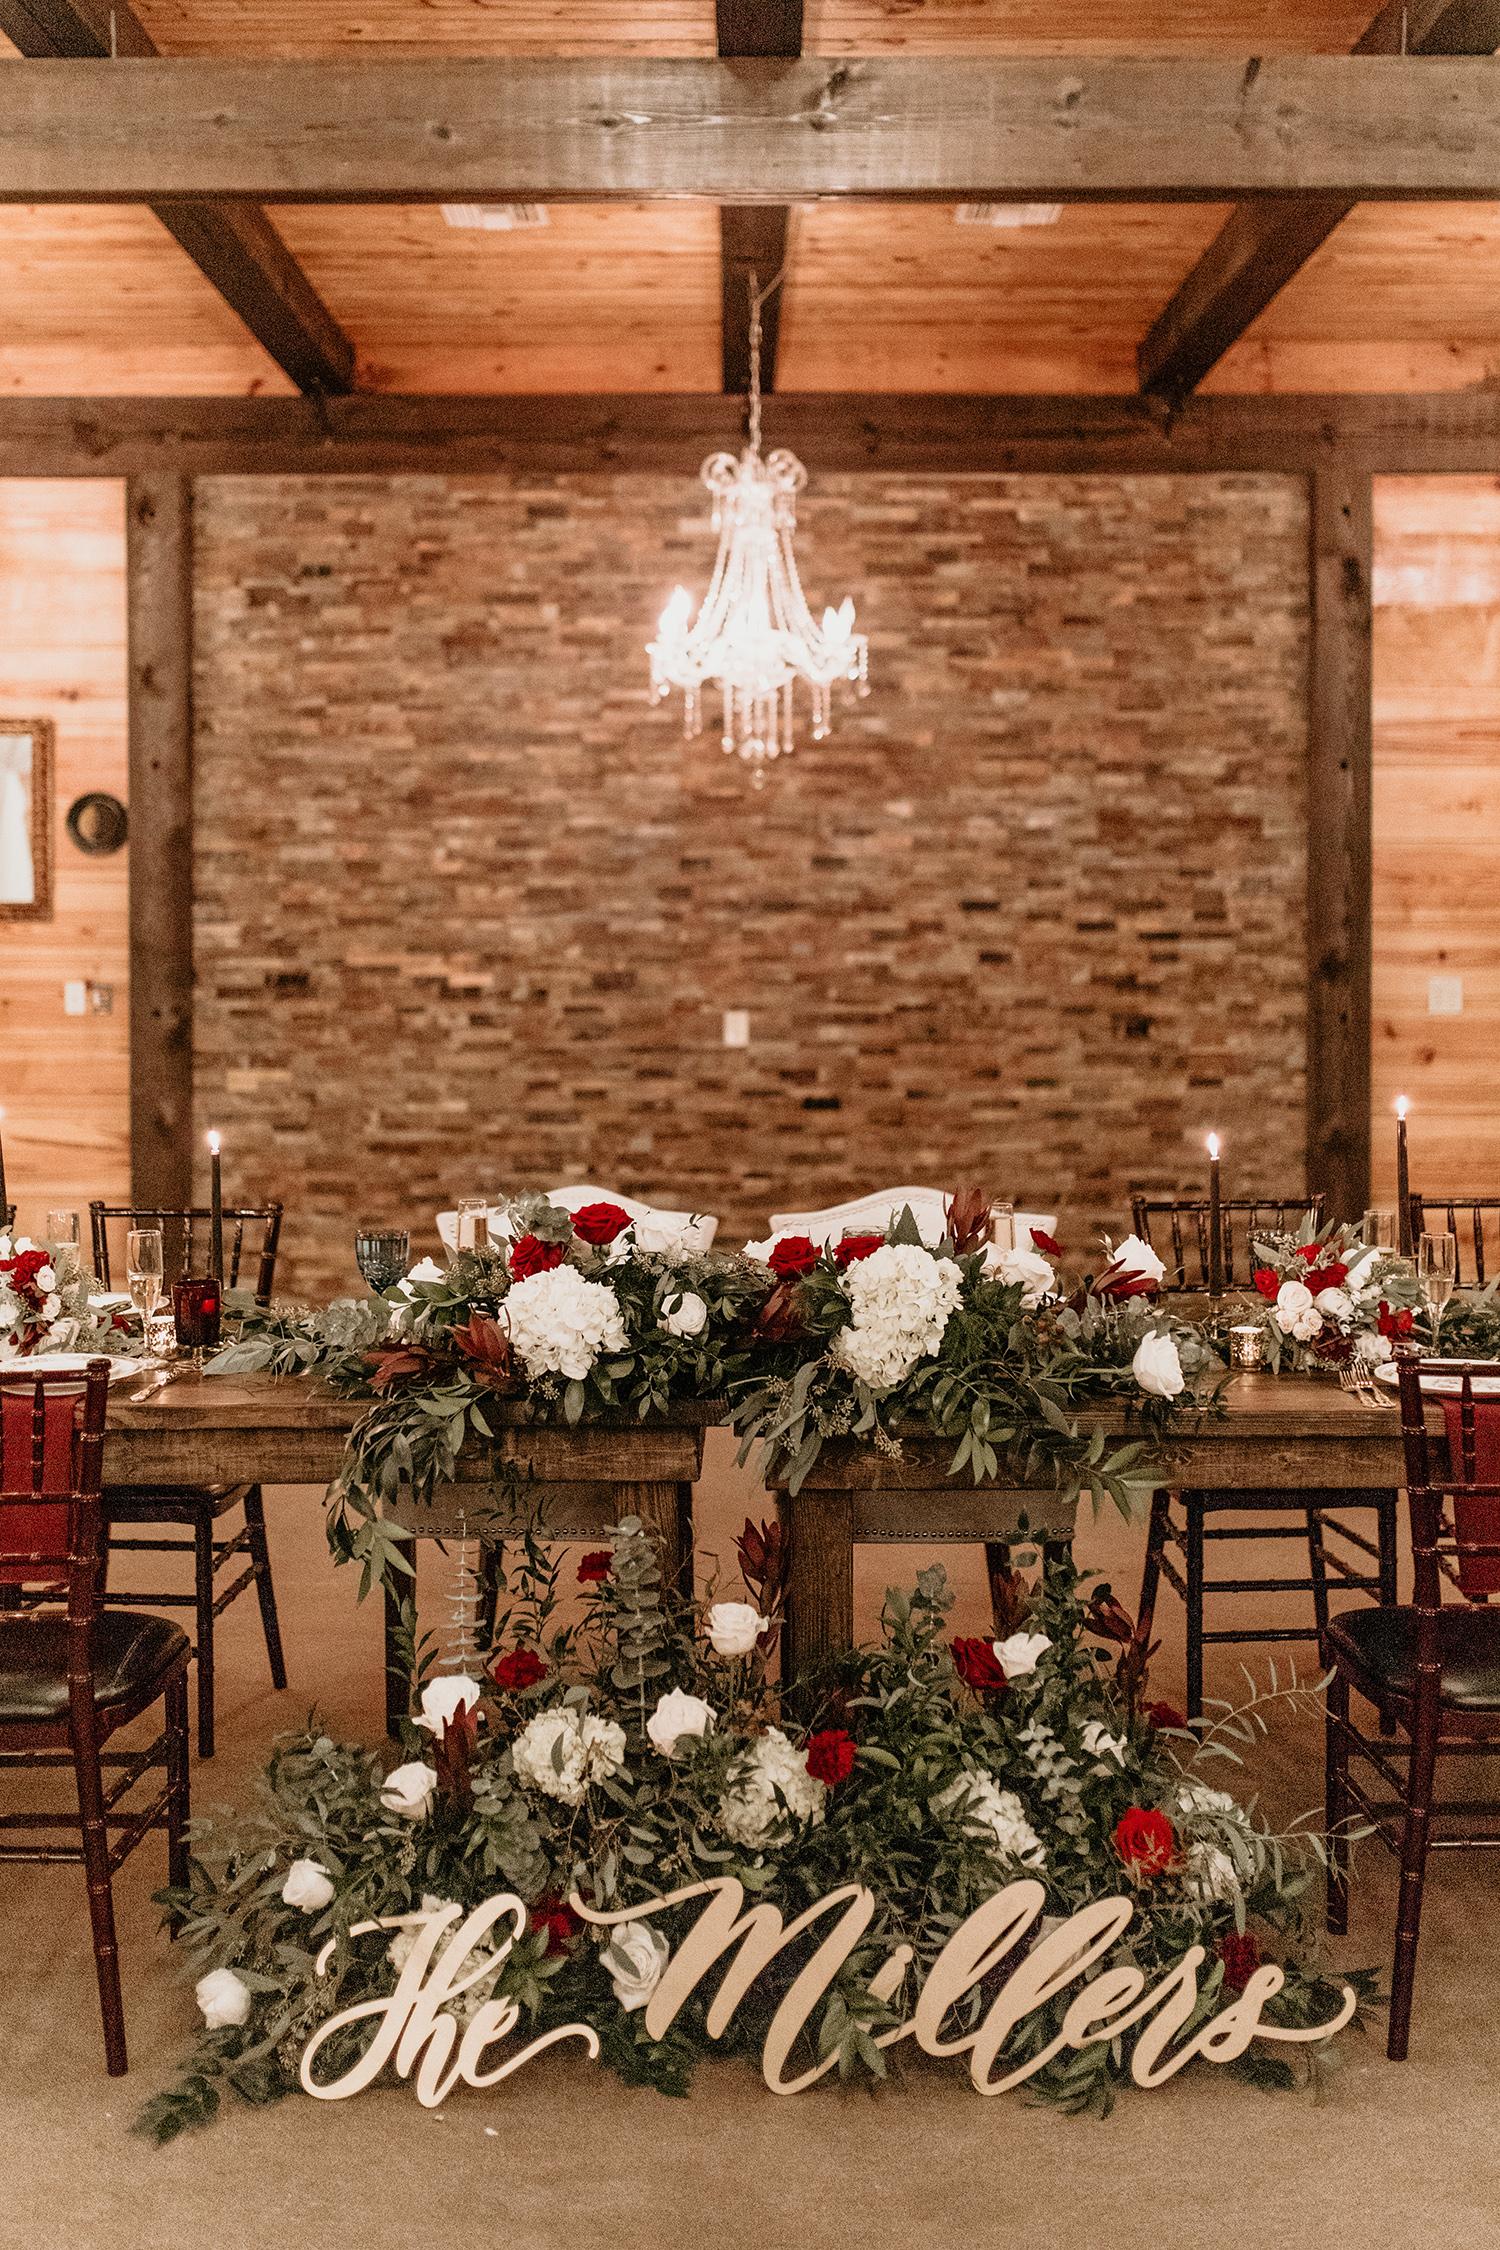 aerielle dyan wedding head table